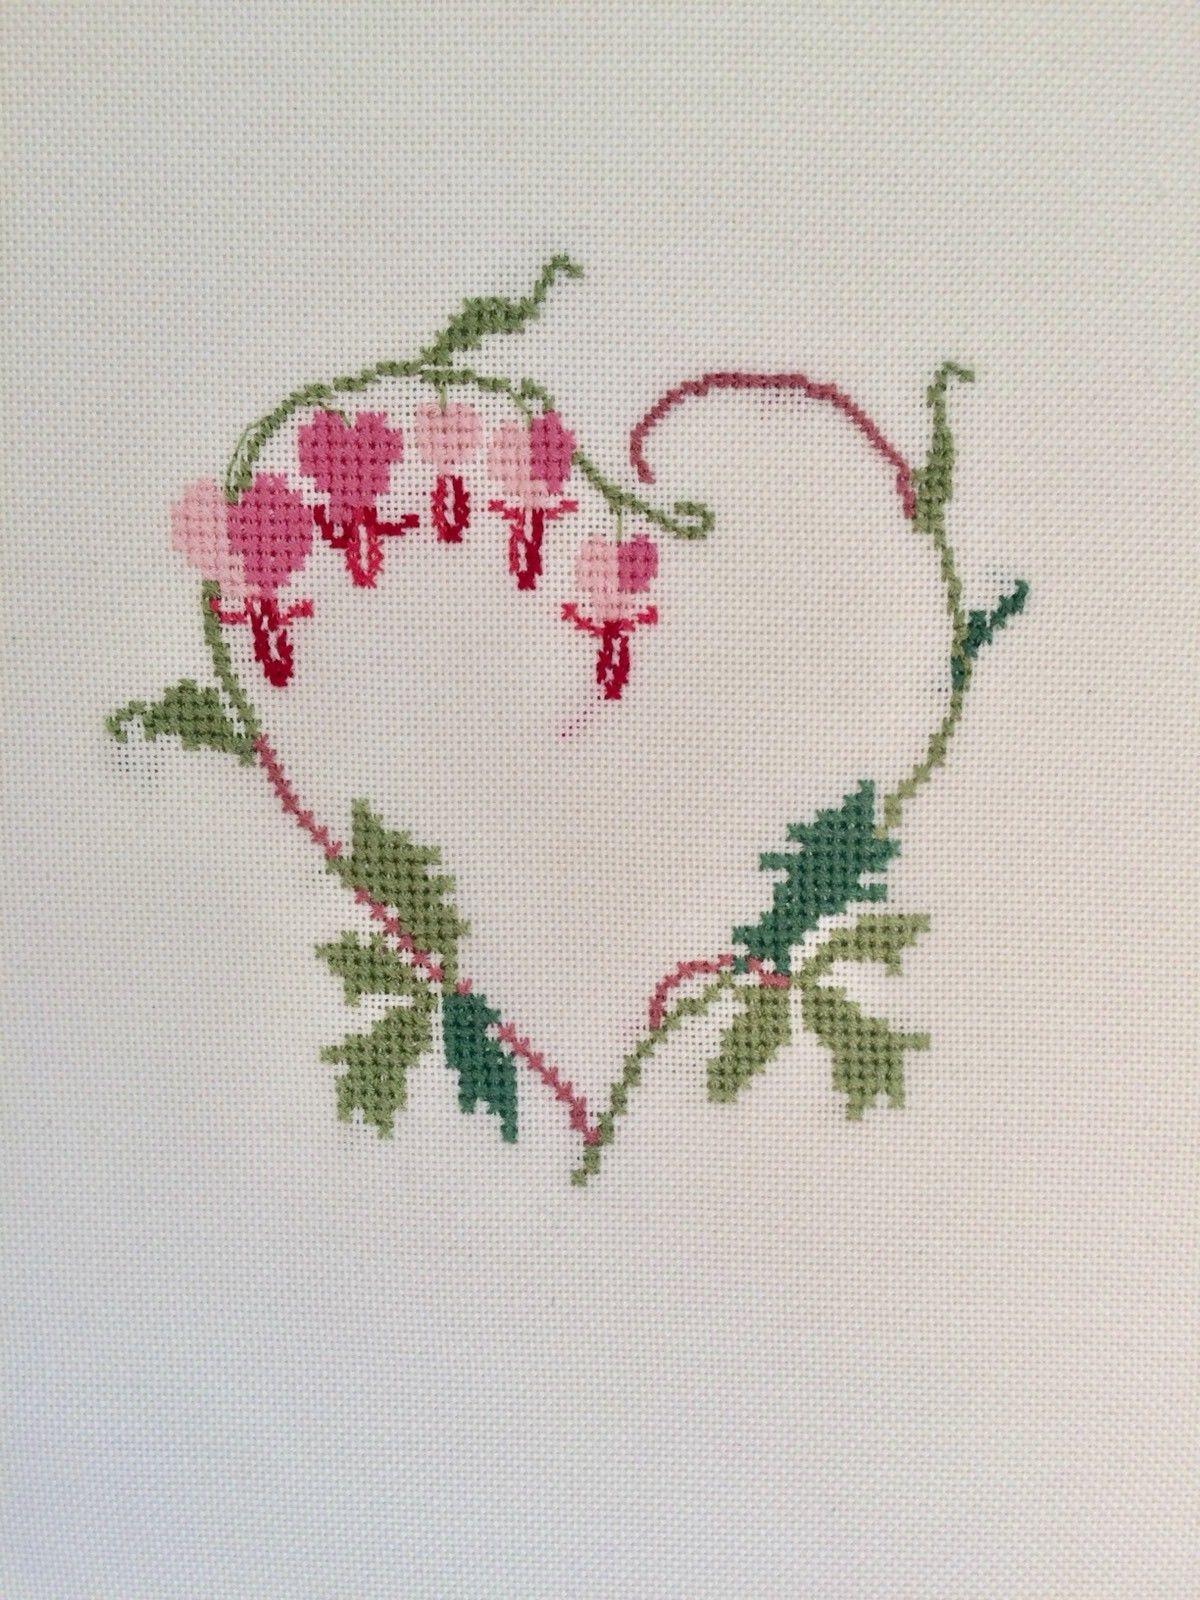 Bevorzugt 🌸 Stickbild Tränendes Herz Christiane Dahlbeck Frühling Ostern GG45